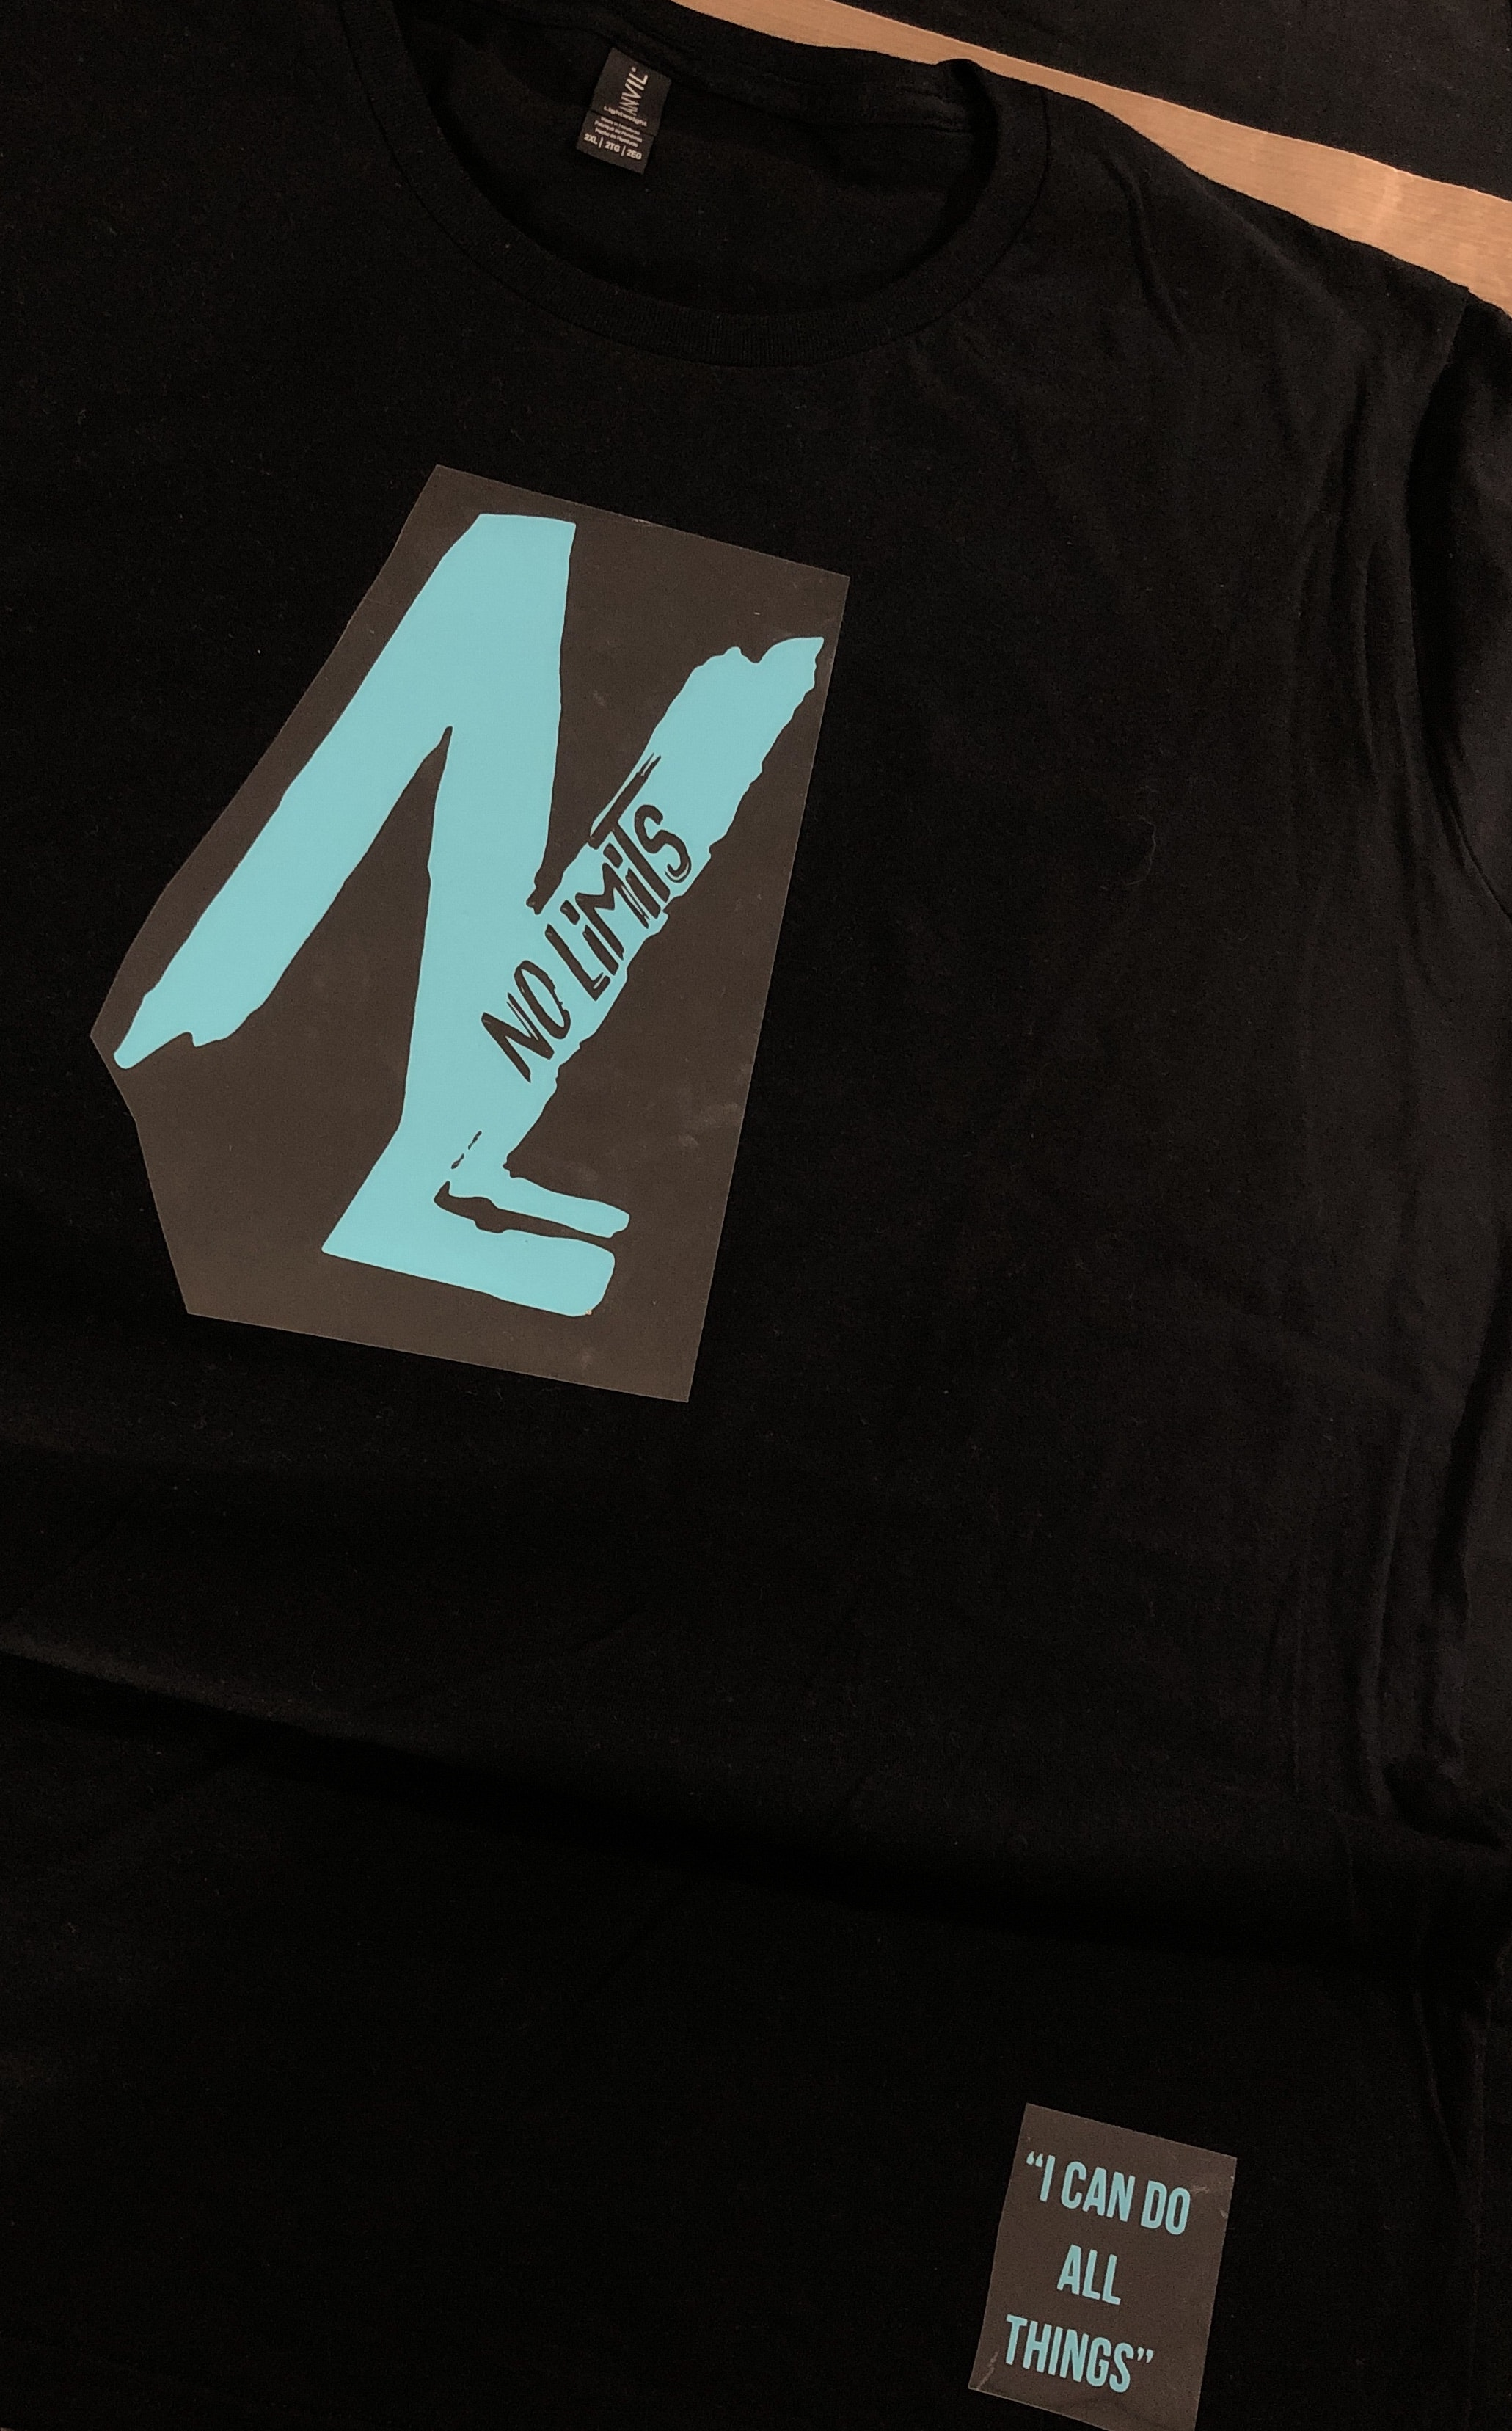 Anvil 884L customer review by Aaron Harris-Dirton Johnson Great feeling t shirt